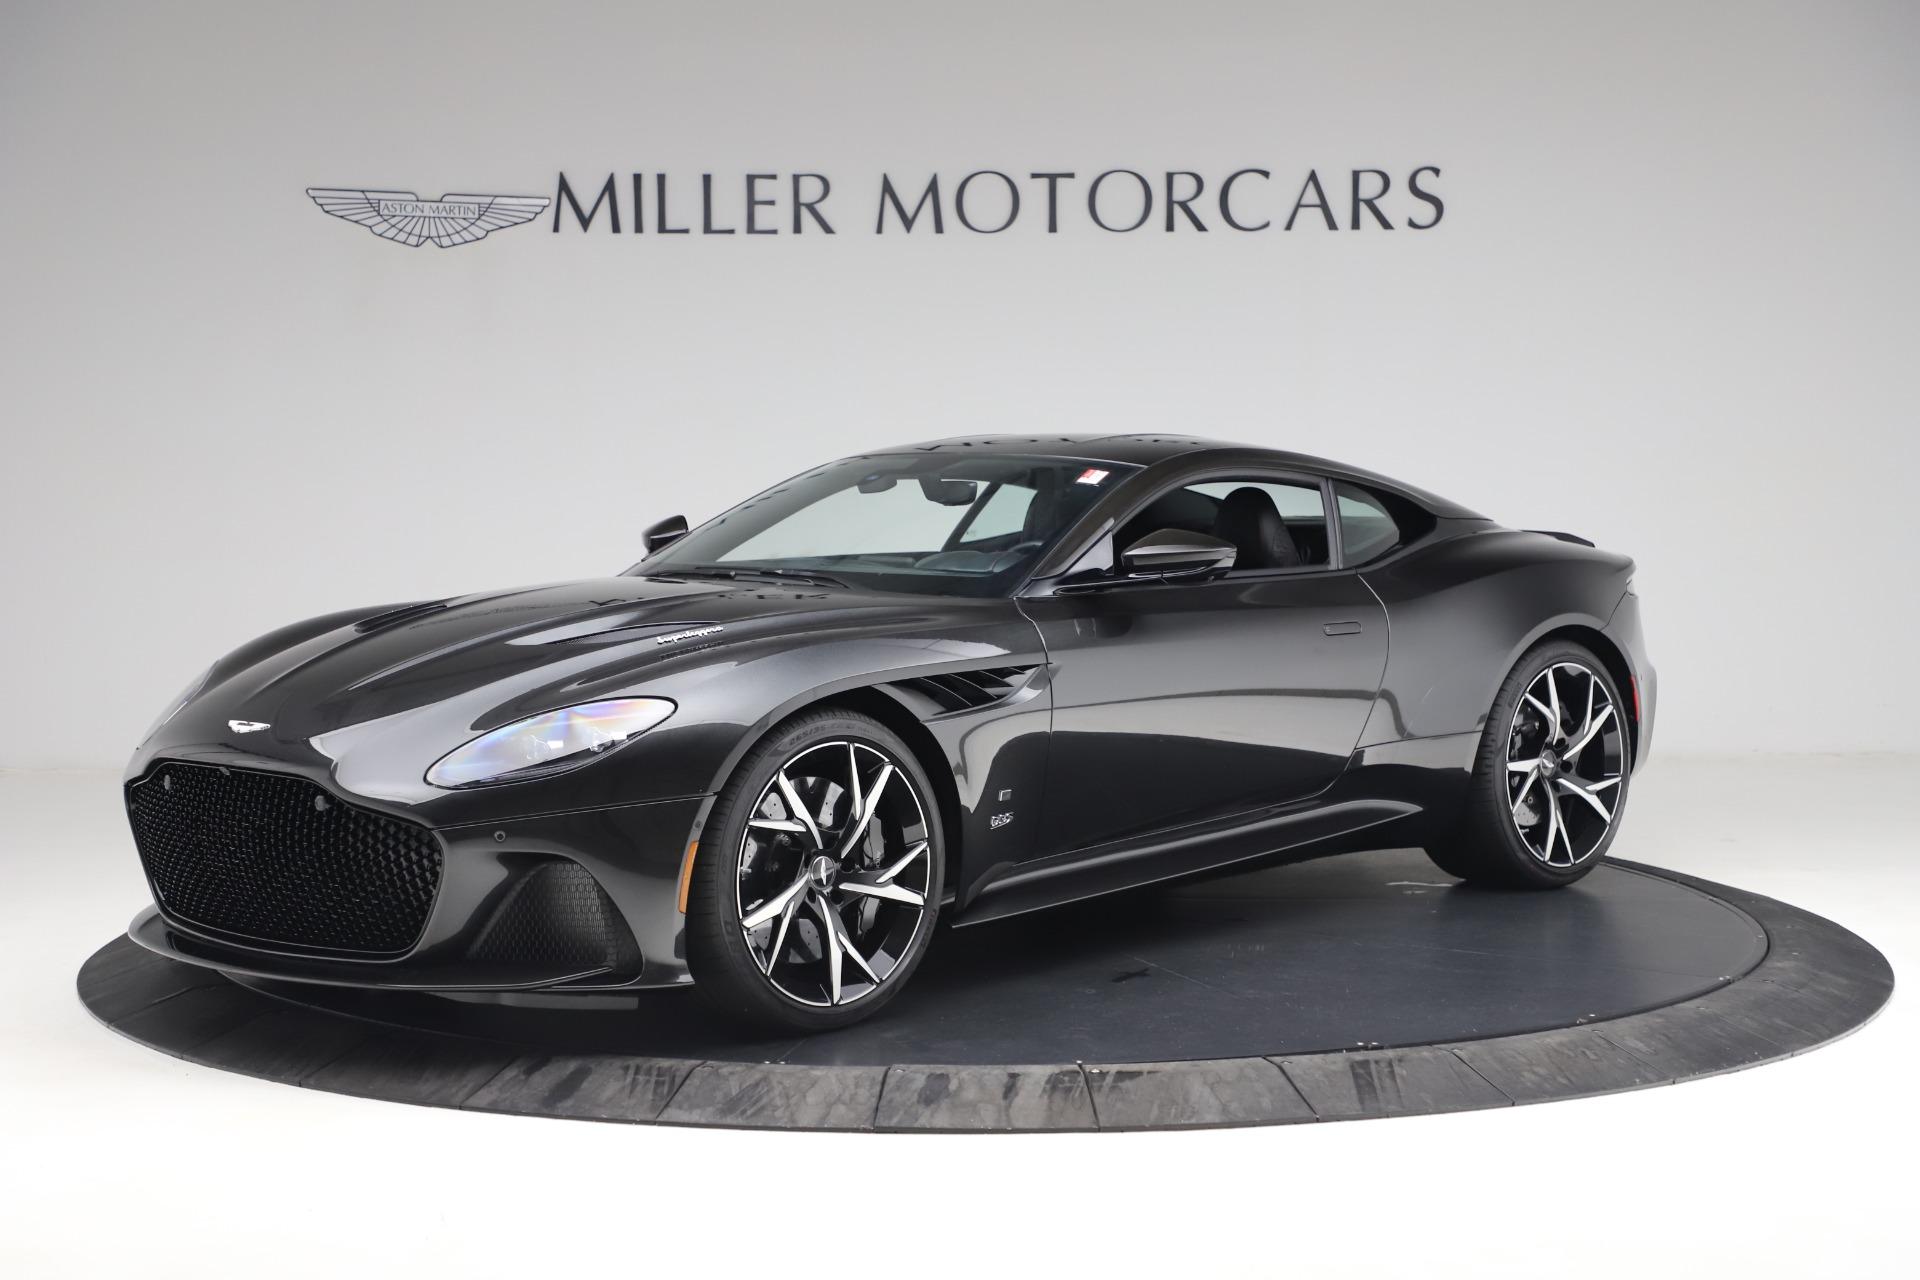 New 2021 Aston Martin DBS Superleggera for sale Sold at Aston Martin of Greenwich in Greenwich CT 06830 1